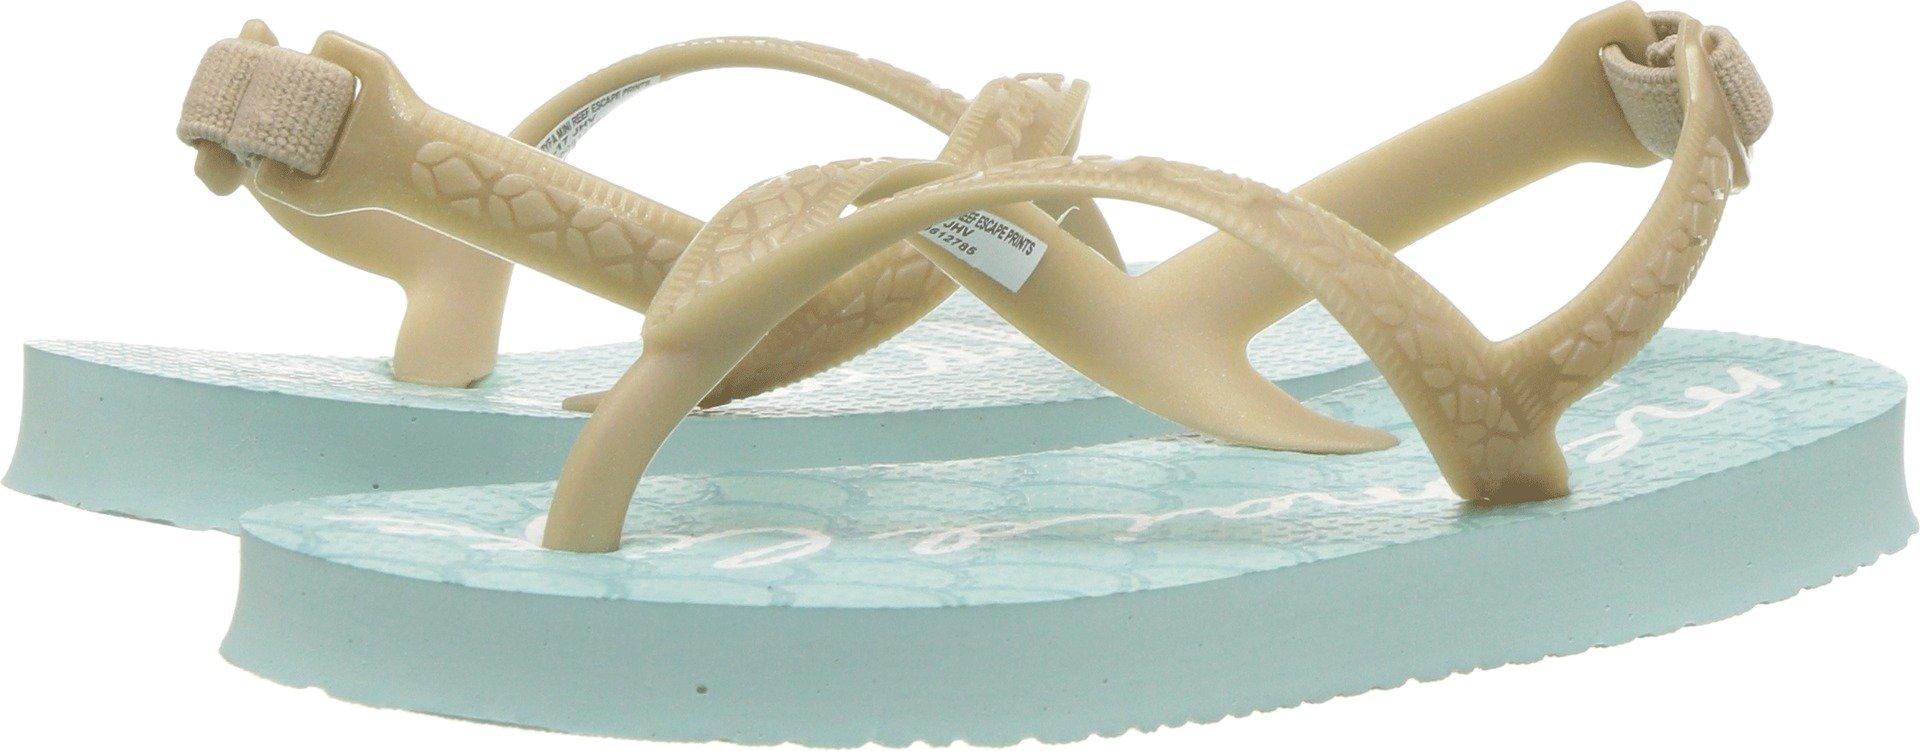 Reef Mini Escape Prints Sandals 7-8 M US Toddler Mermaid Life